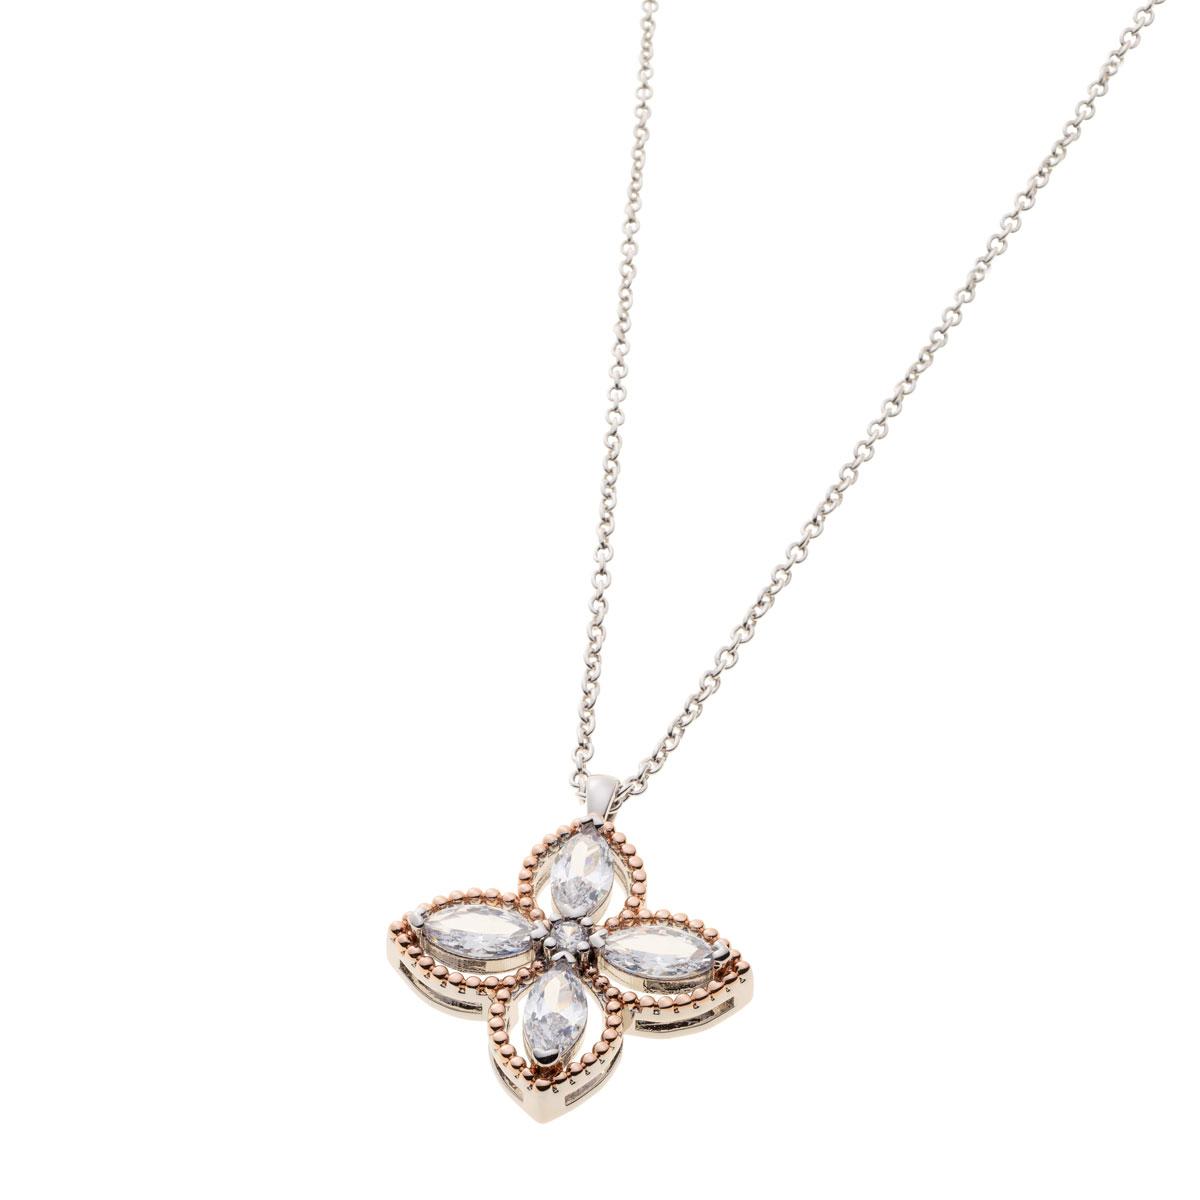 Belleek Living Jewelry Quart Necklace